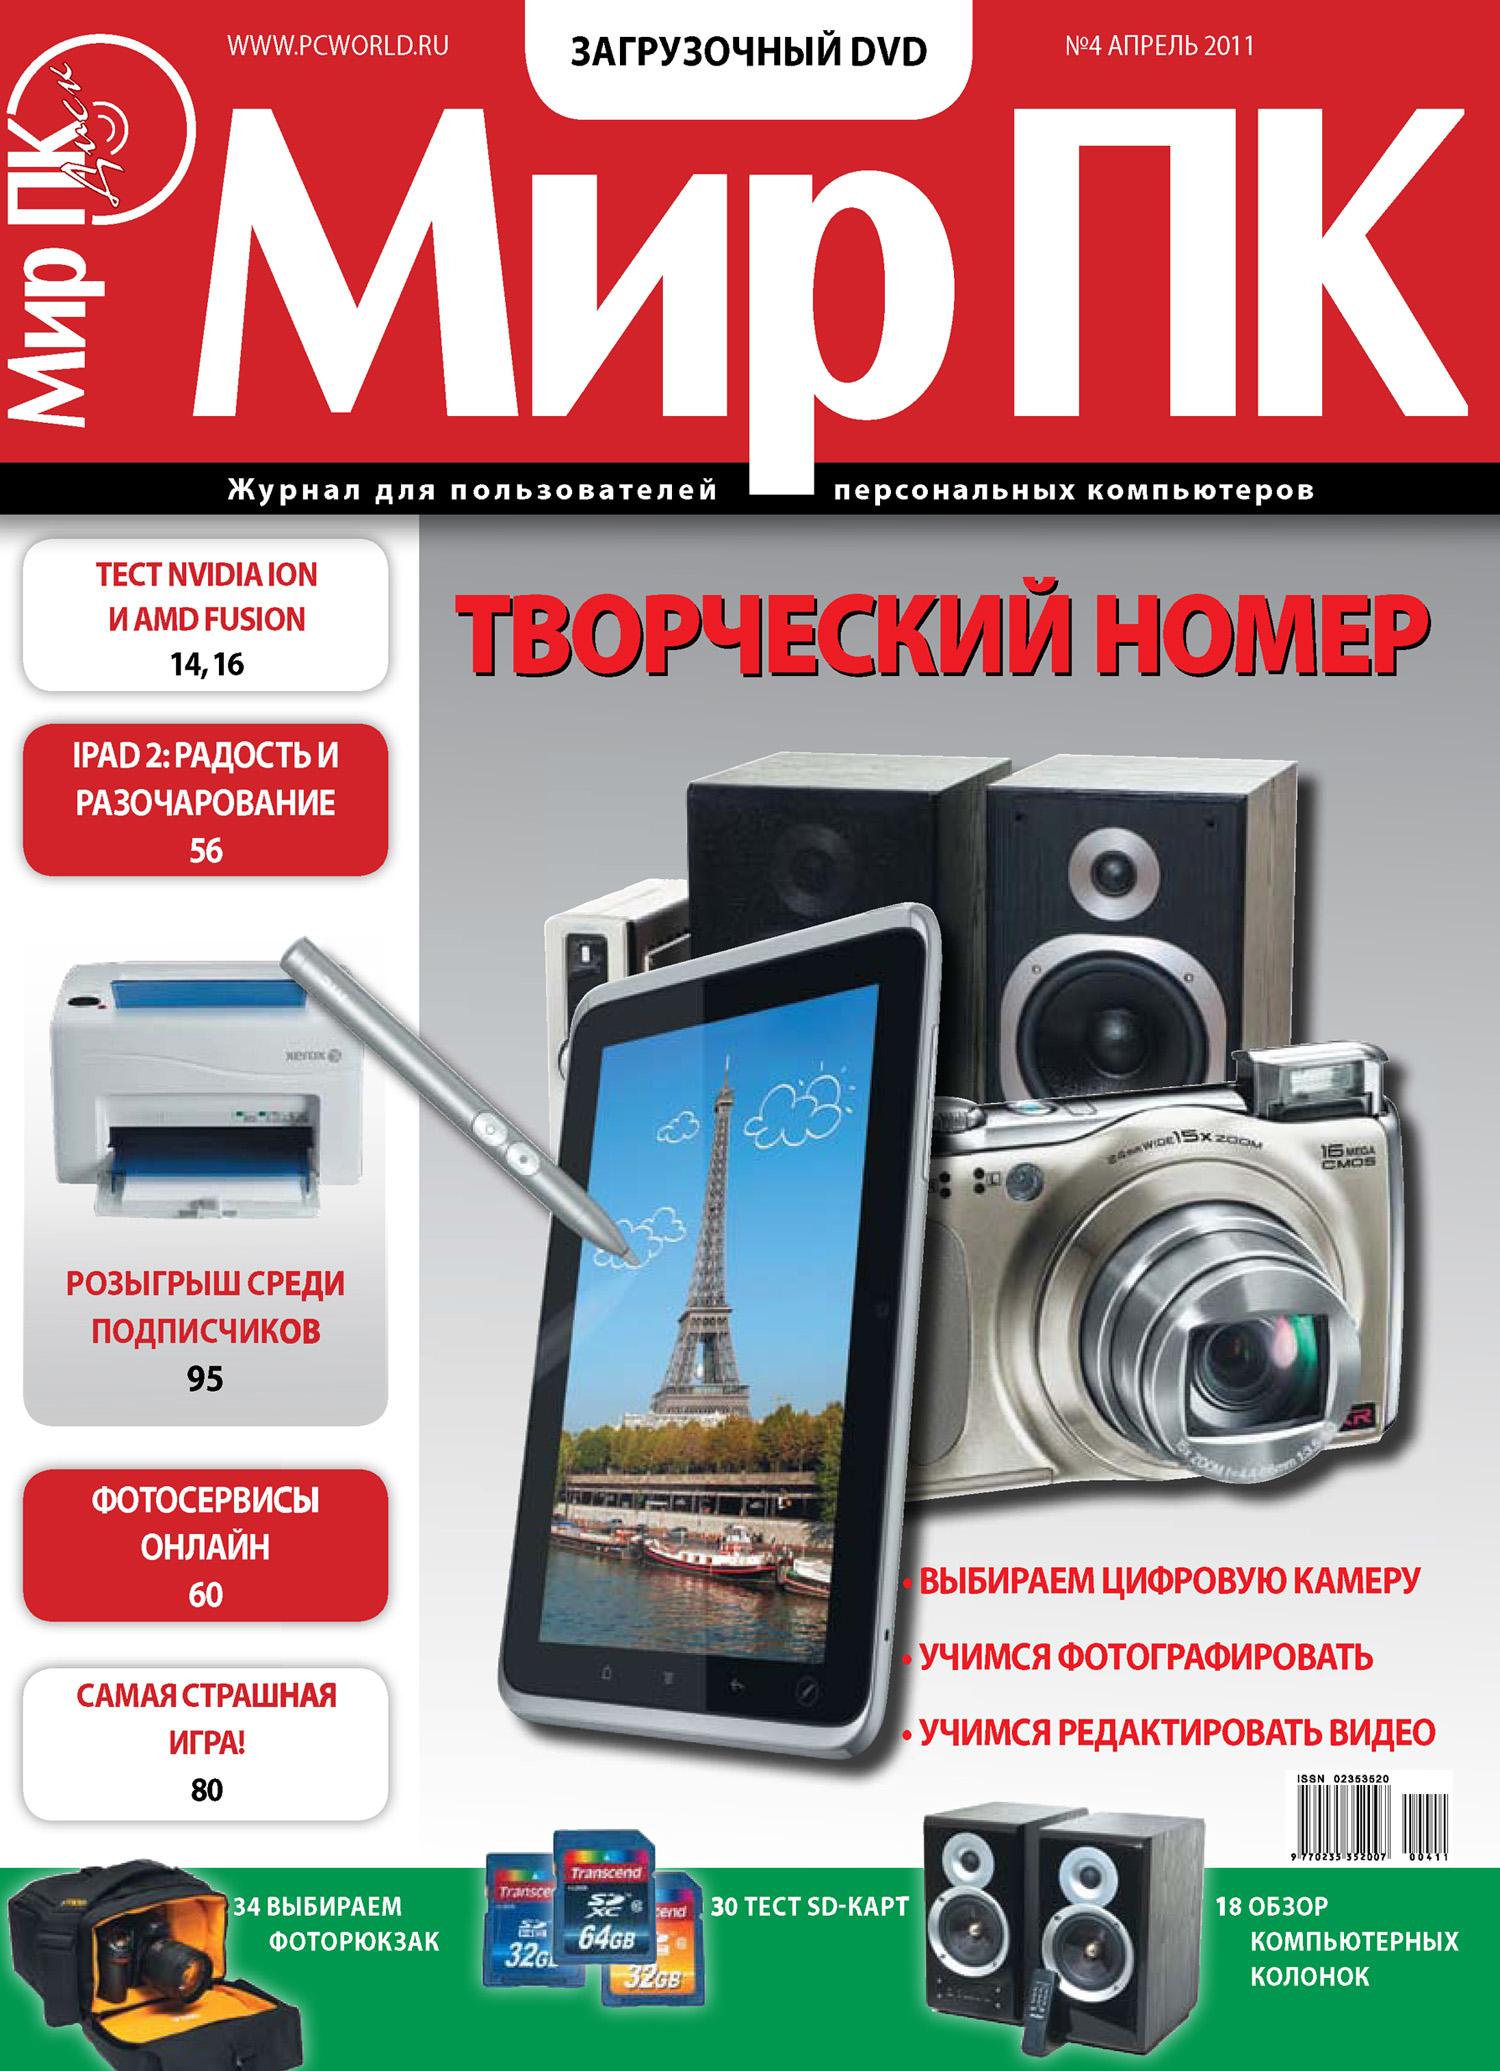 Журнал «Мир ПК» №04/2011